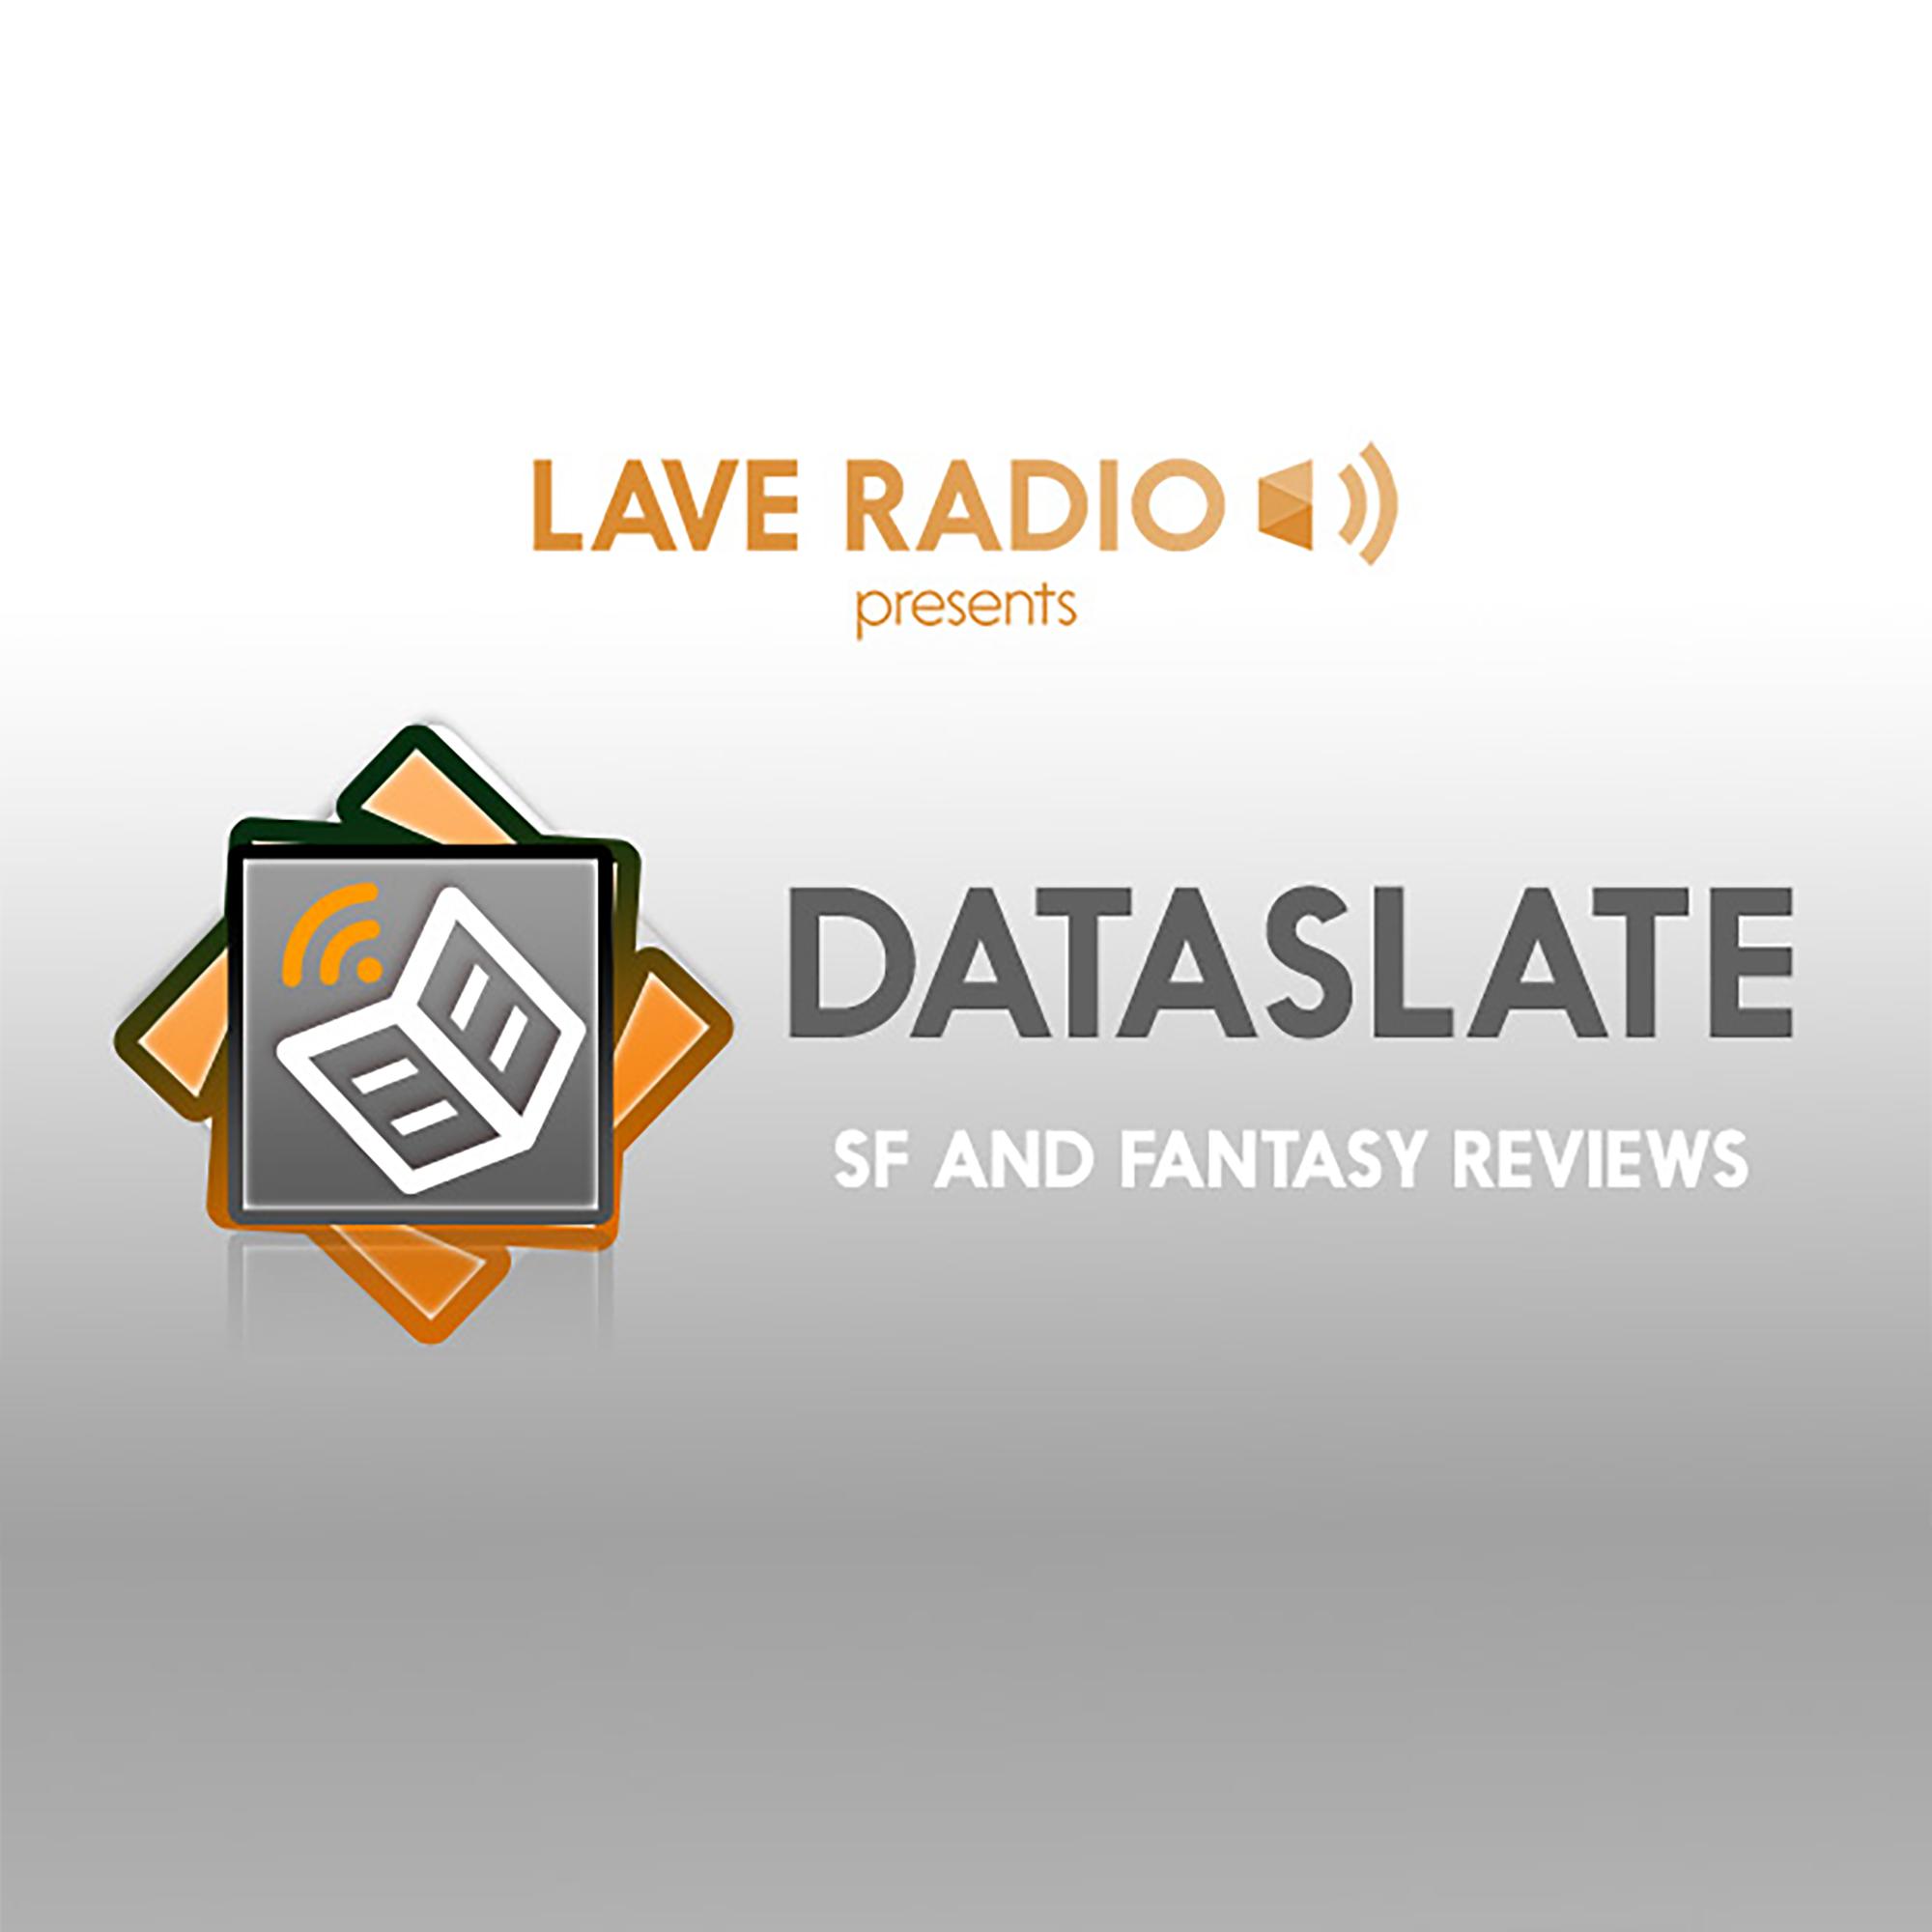 Lave Radio's Dataslate :